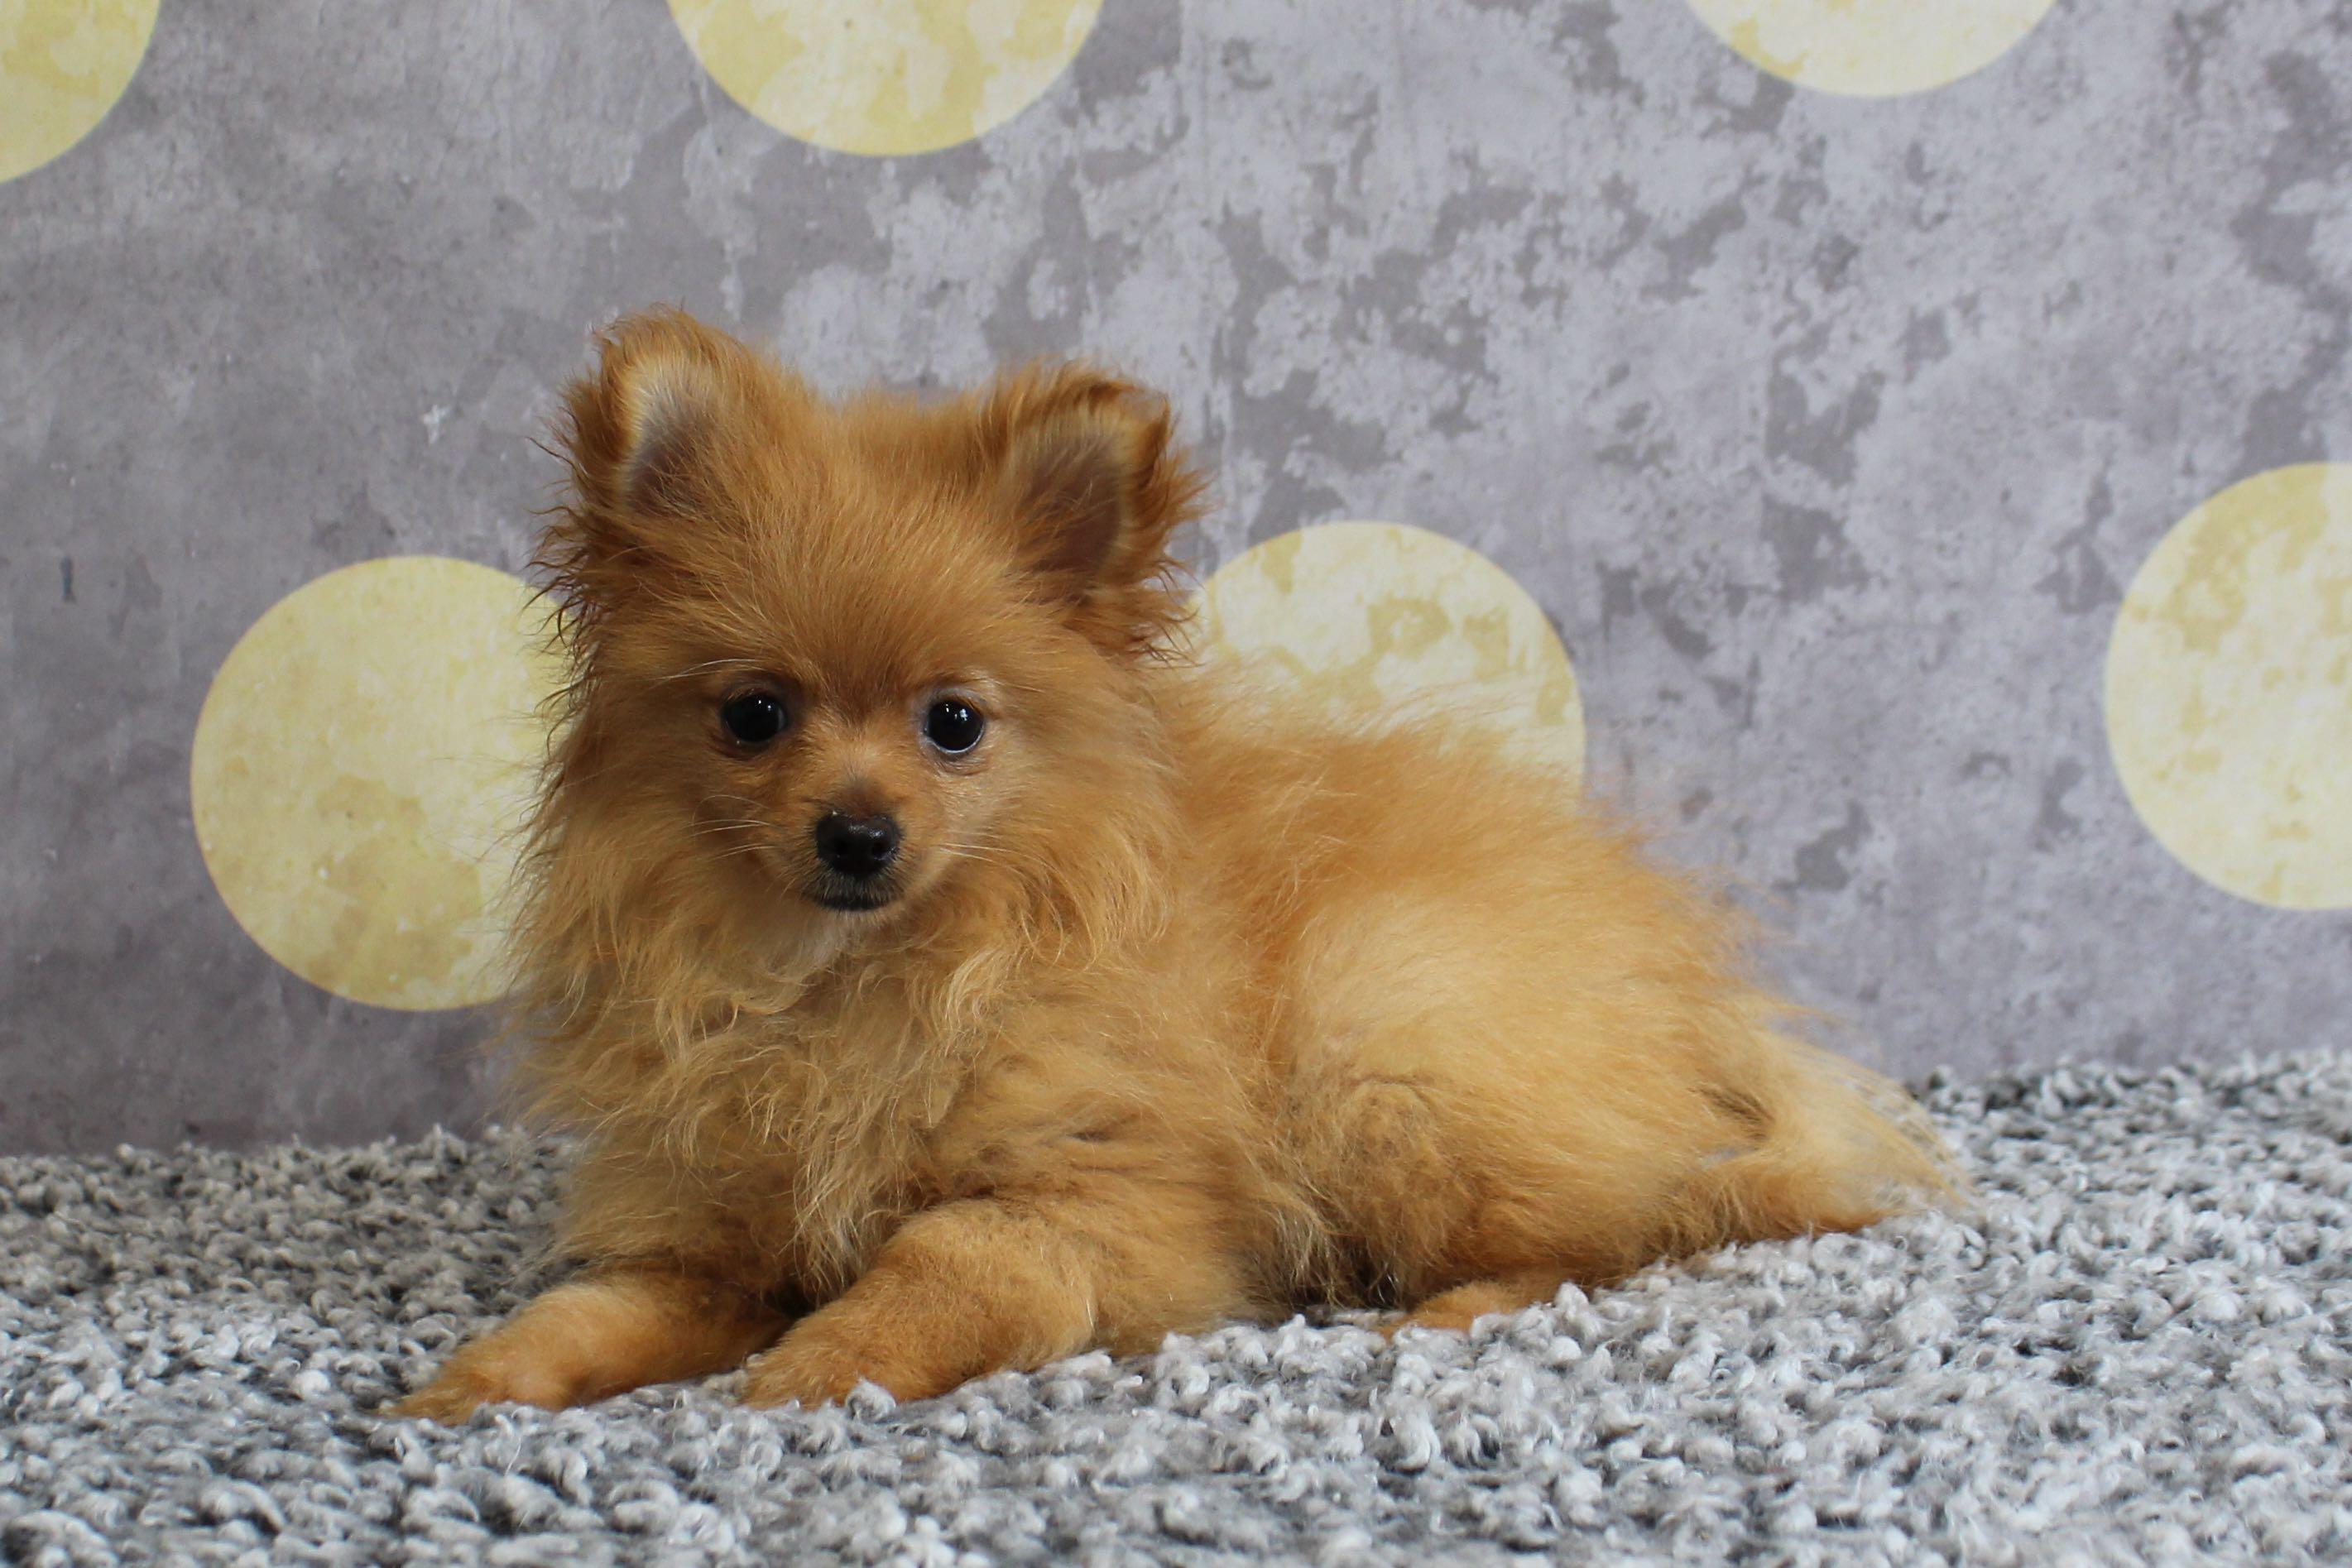 PomeranianHannah7807